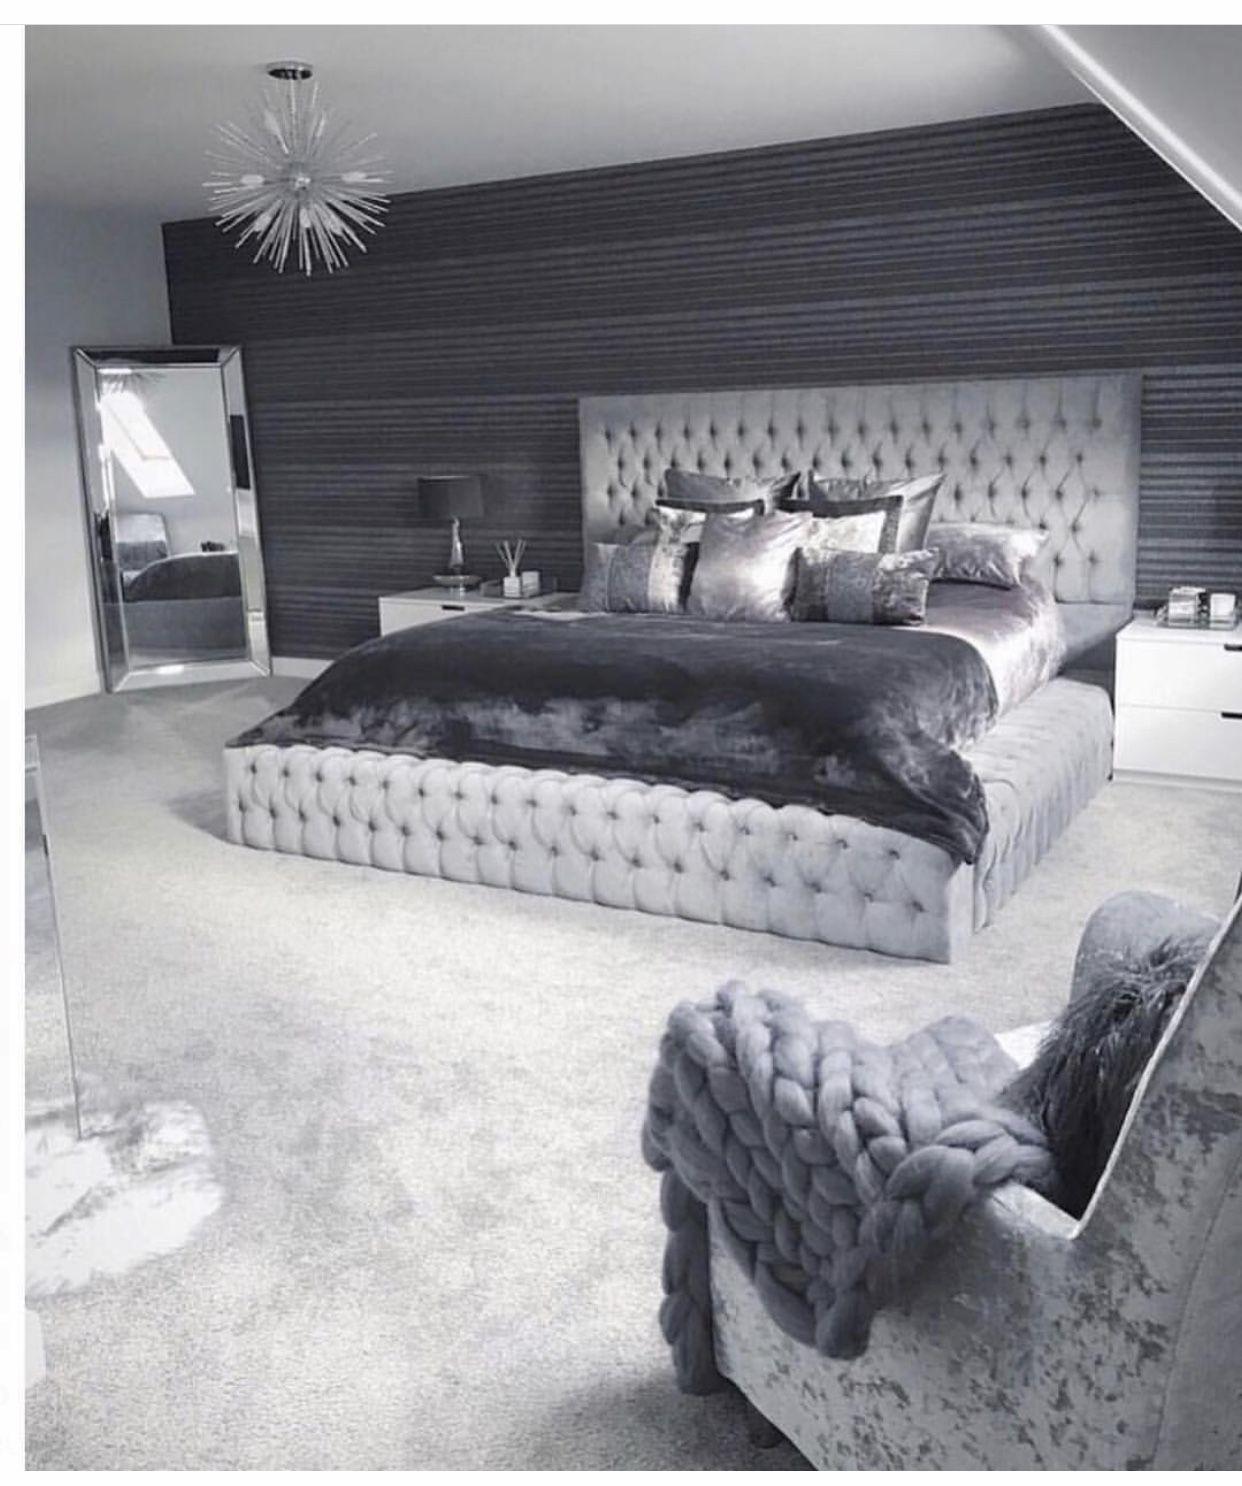 Pin by Demi steel on Bedroom decor  Cozy master bedroom design